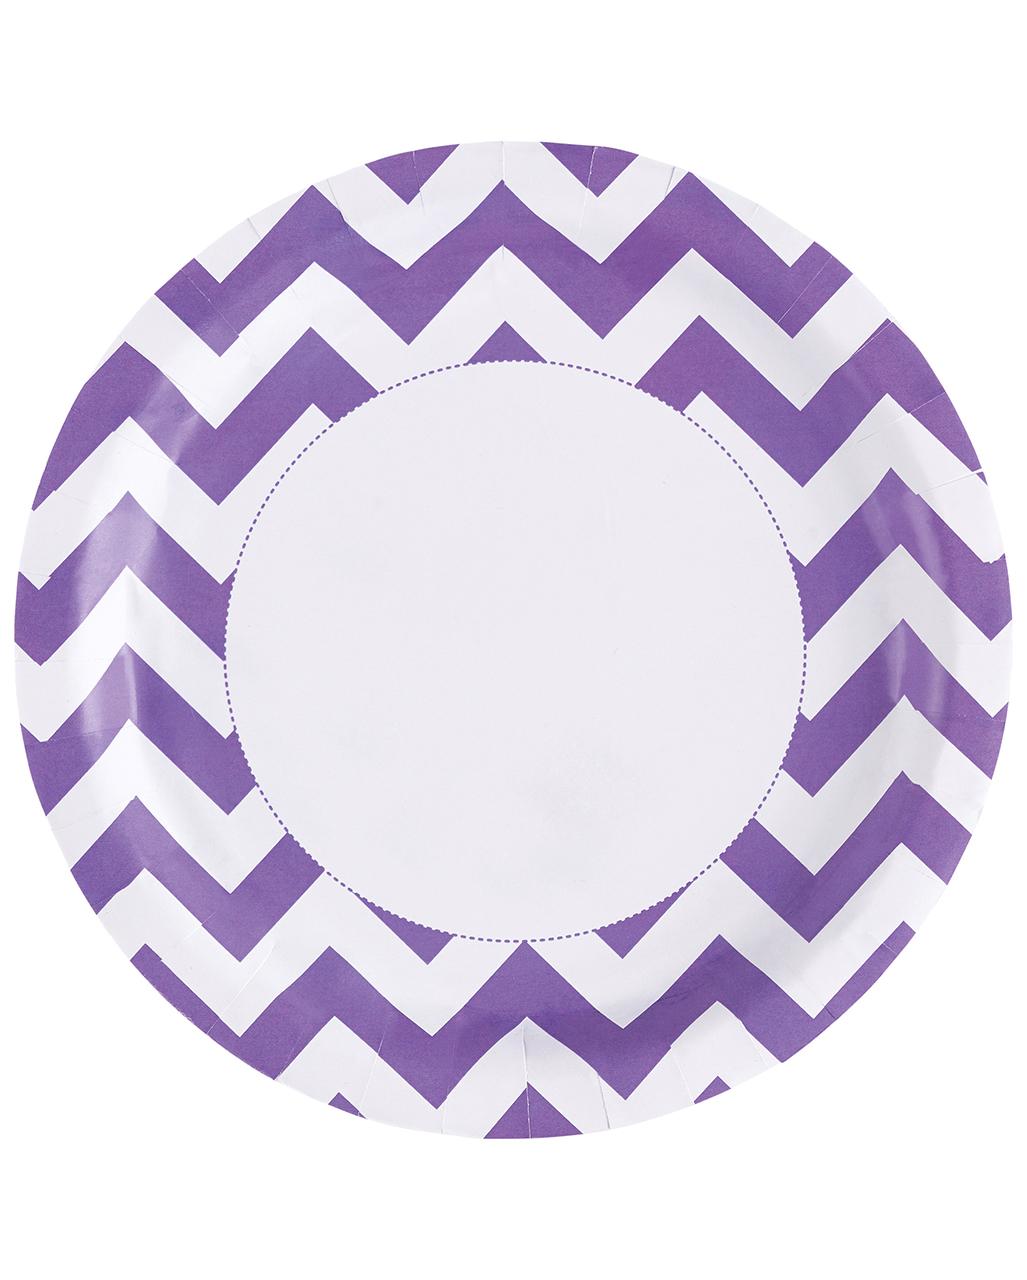 sc 1 st  Horror-Shop.com & Purple Zig-zag Paper Plate 8 Pcs. ✿ Buy HERE   horror-shop.com